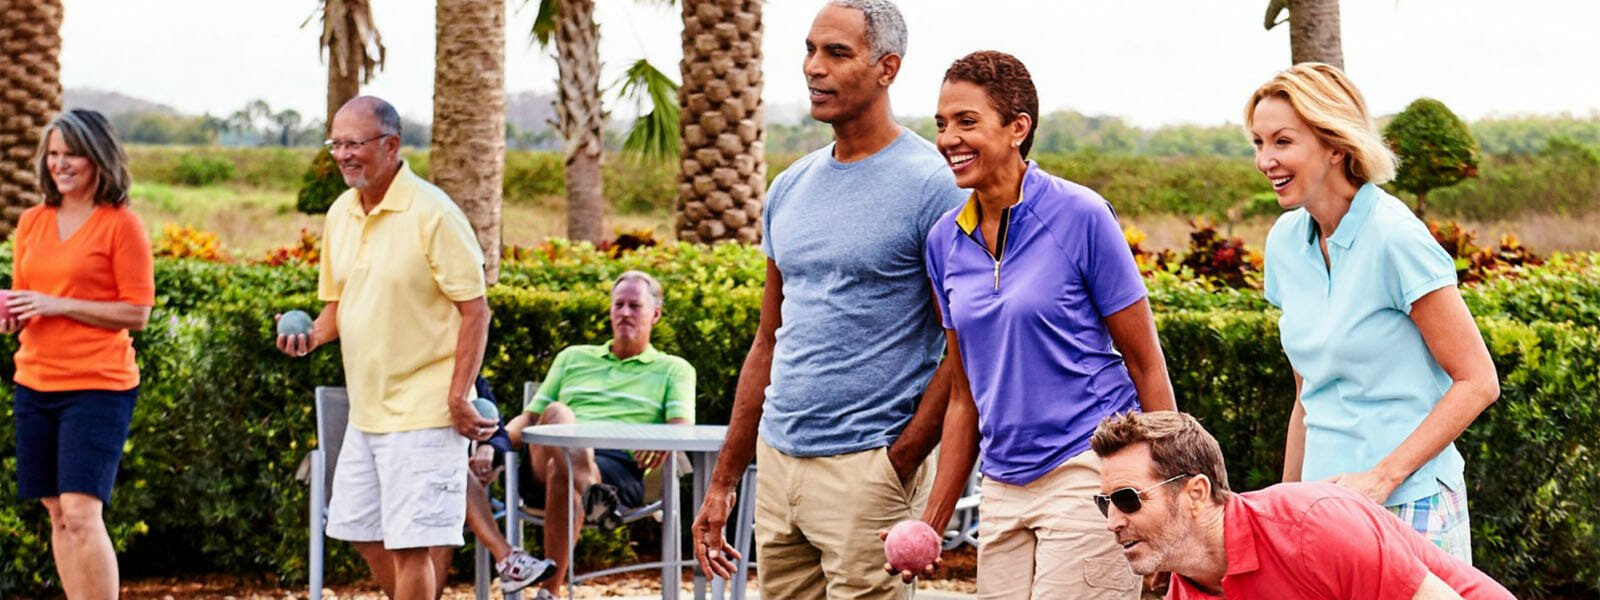 Del Webb Oasis | 55 Plus Resort Community near Orlando FL | Winter Garden